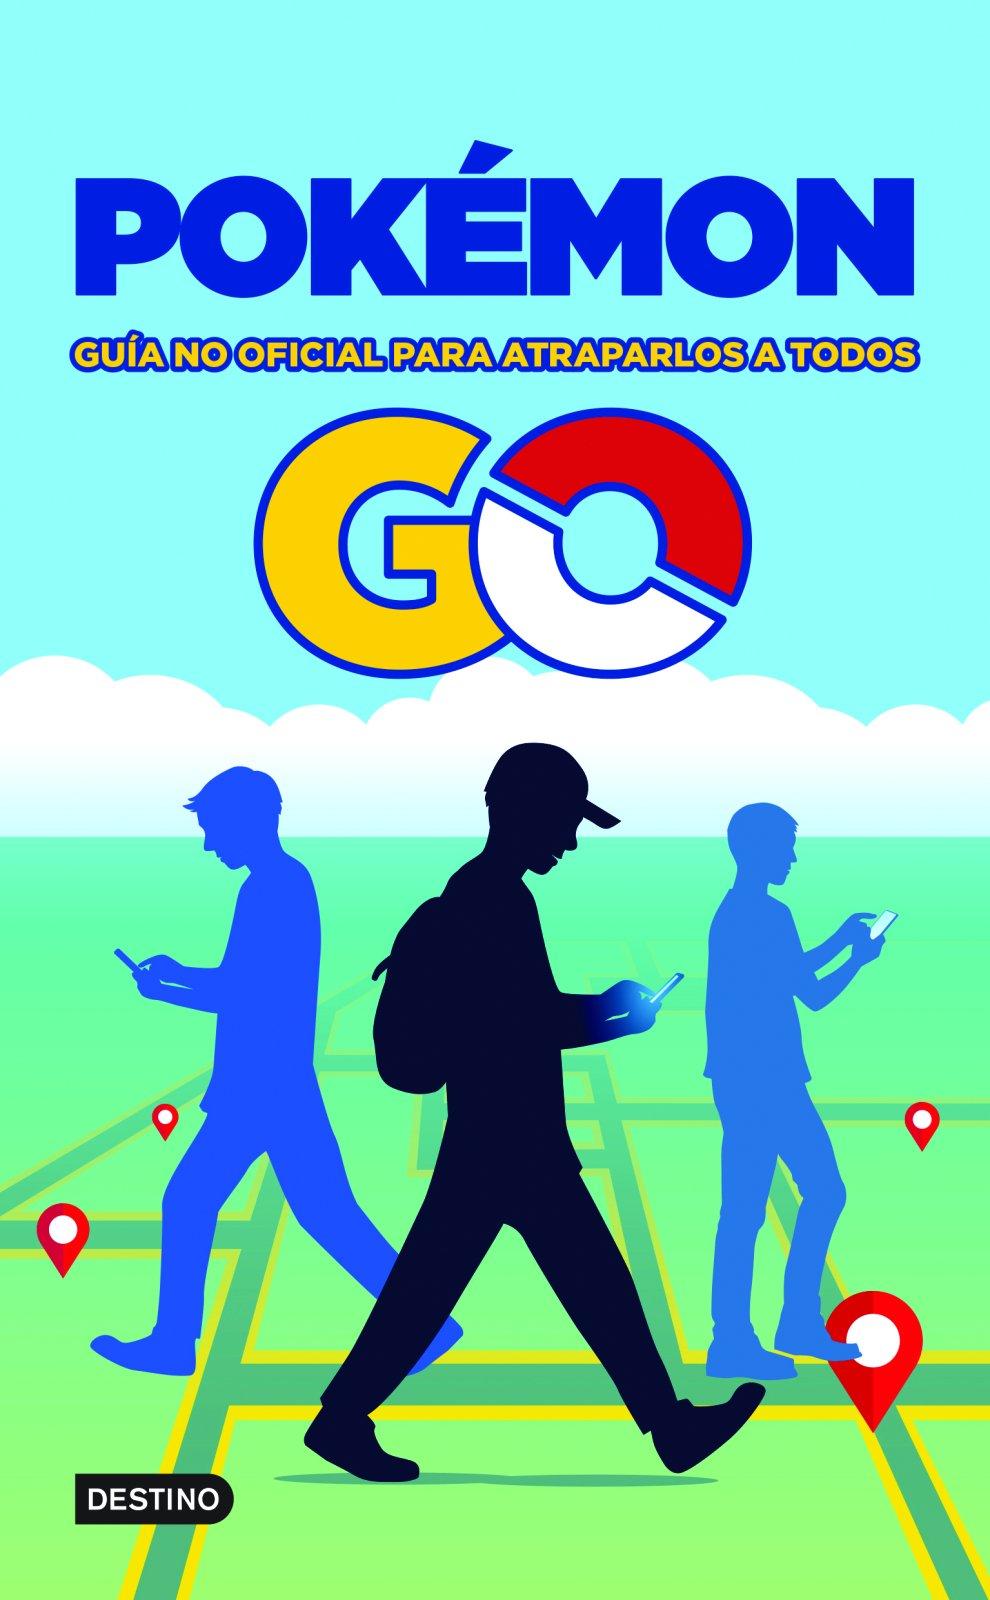 Pokémon GO. Guía no oficial para atraparlos a todos (Spanish Edition) pdf epub